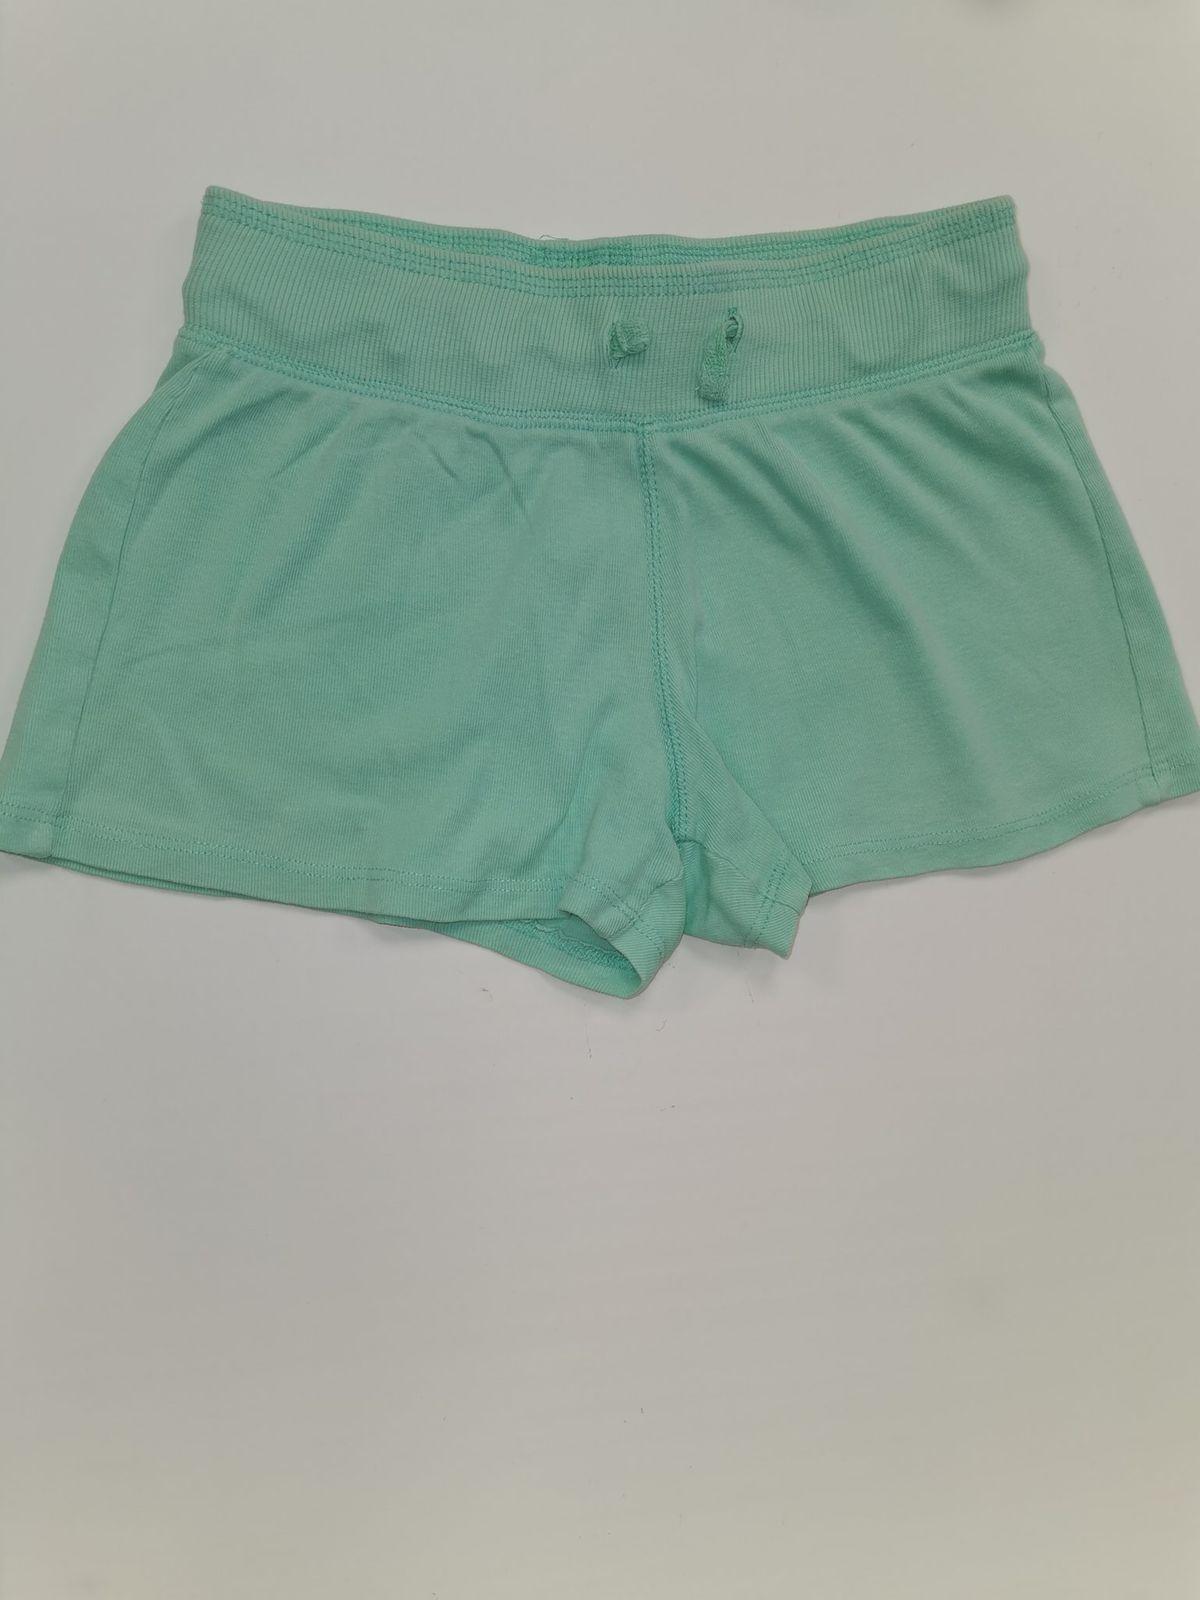 13271. Pantalone 9/10 anni Euro 4,50